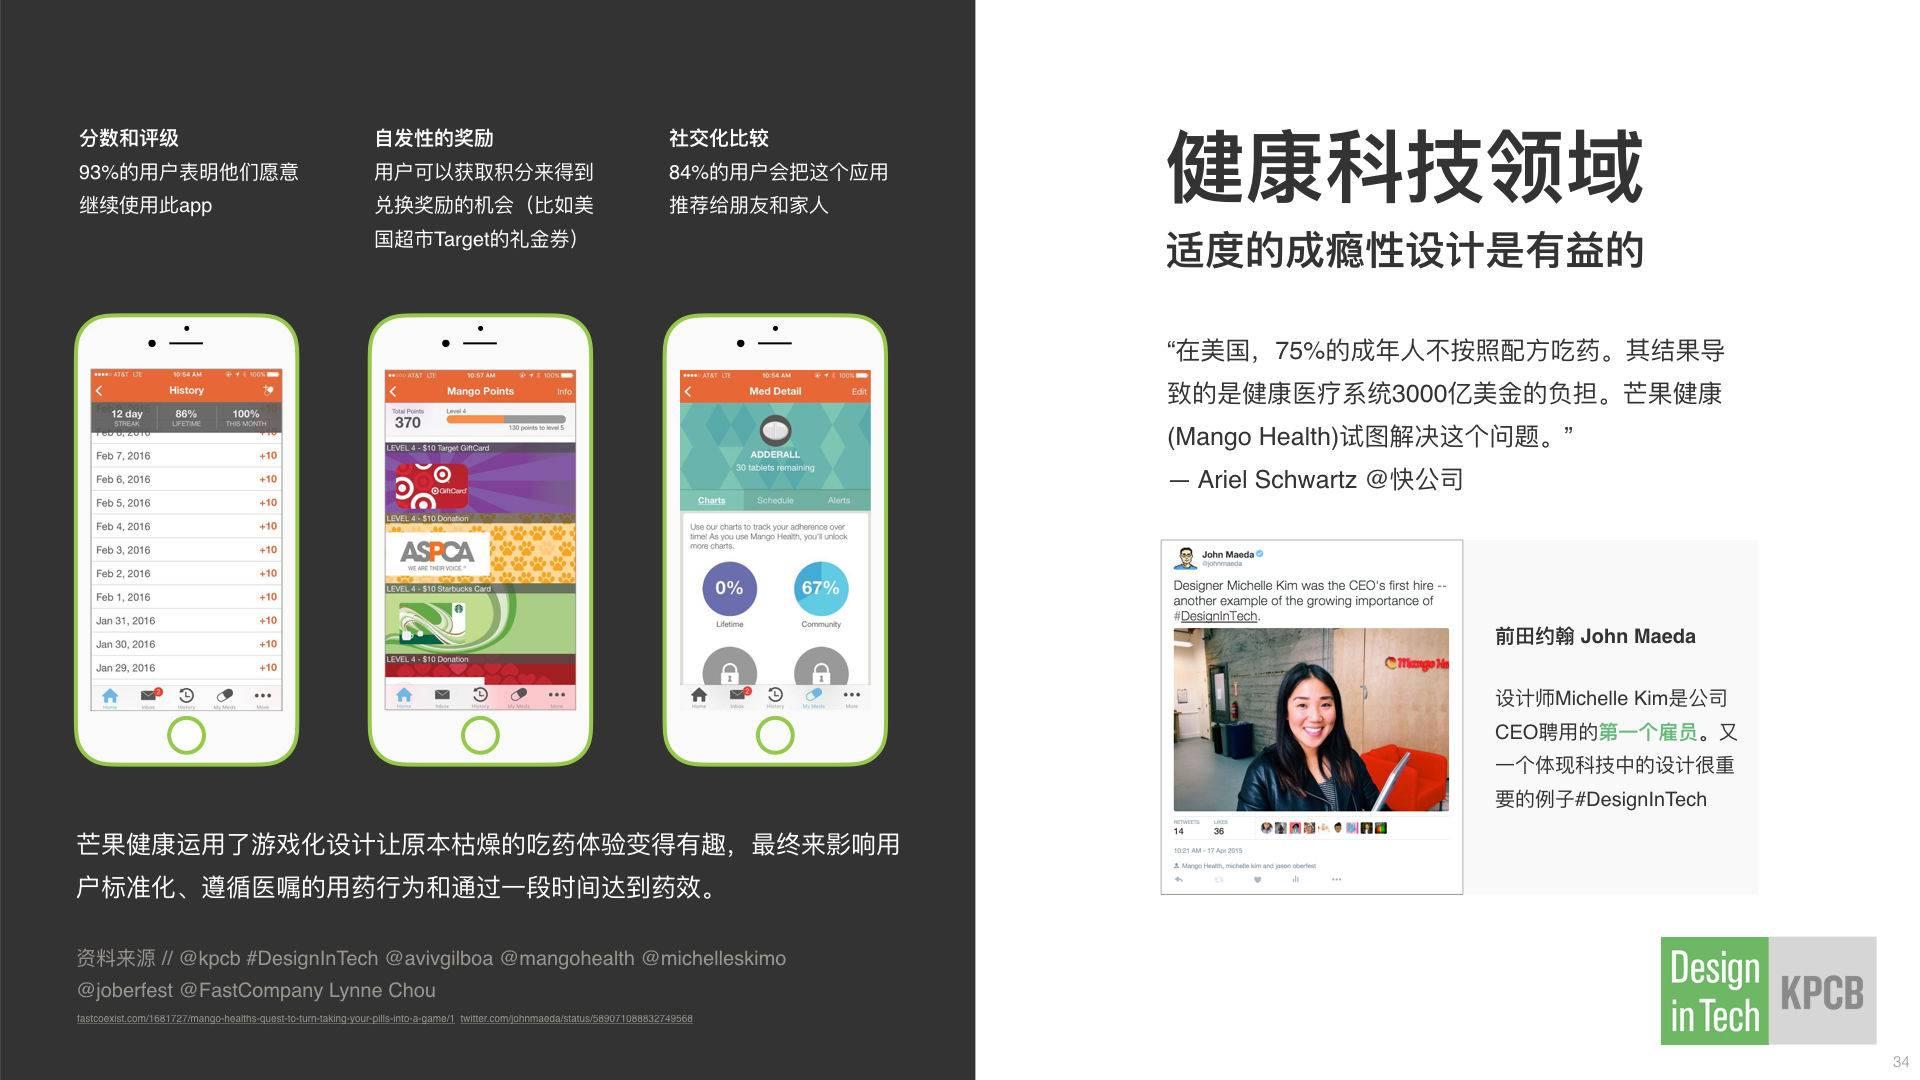 2016DesignInTech科技中的设计(Chinese).034.jpeg